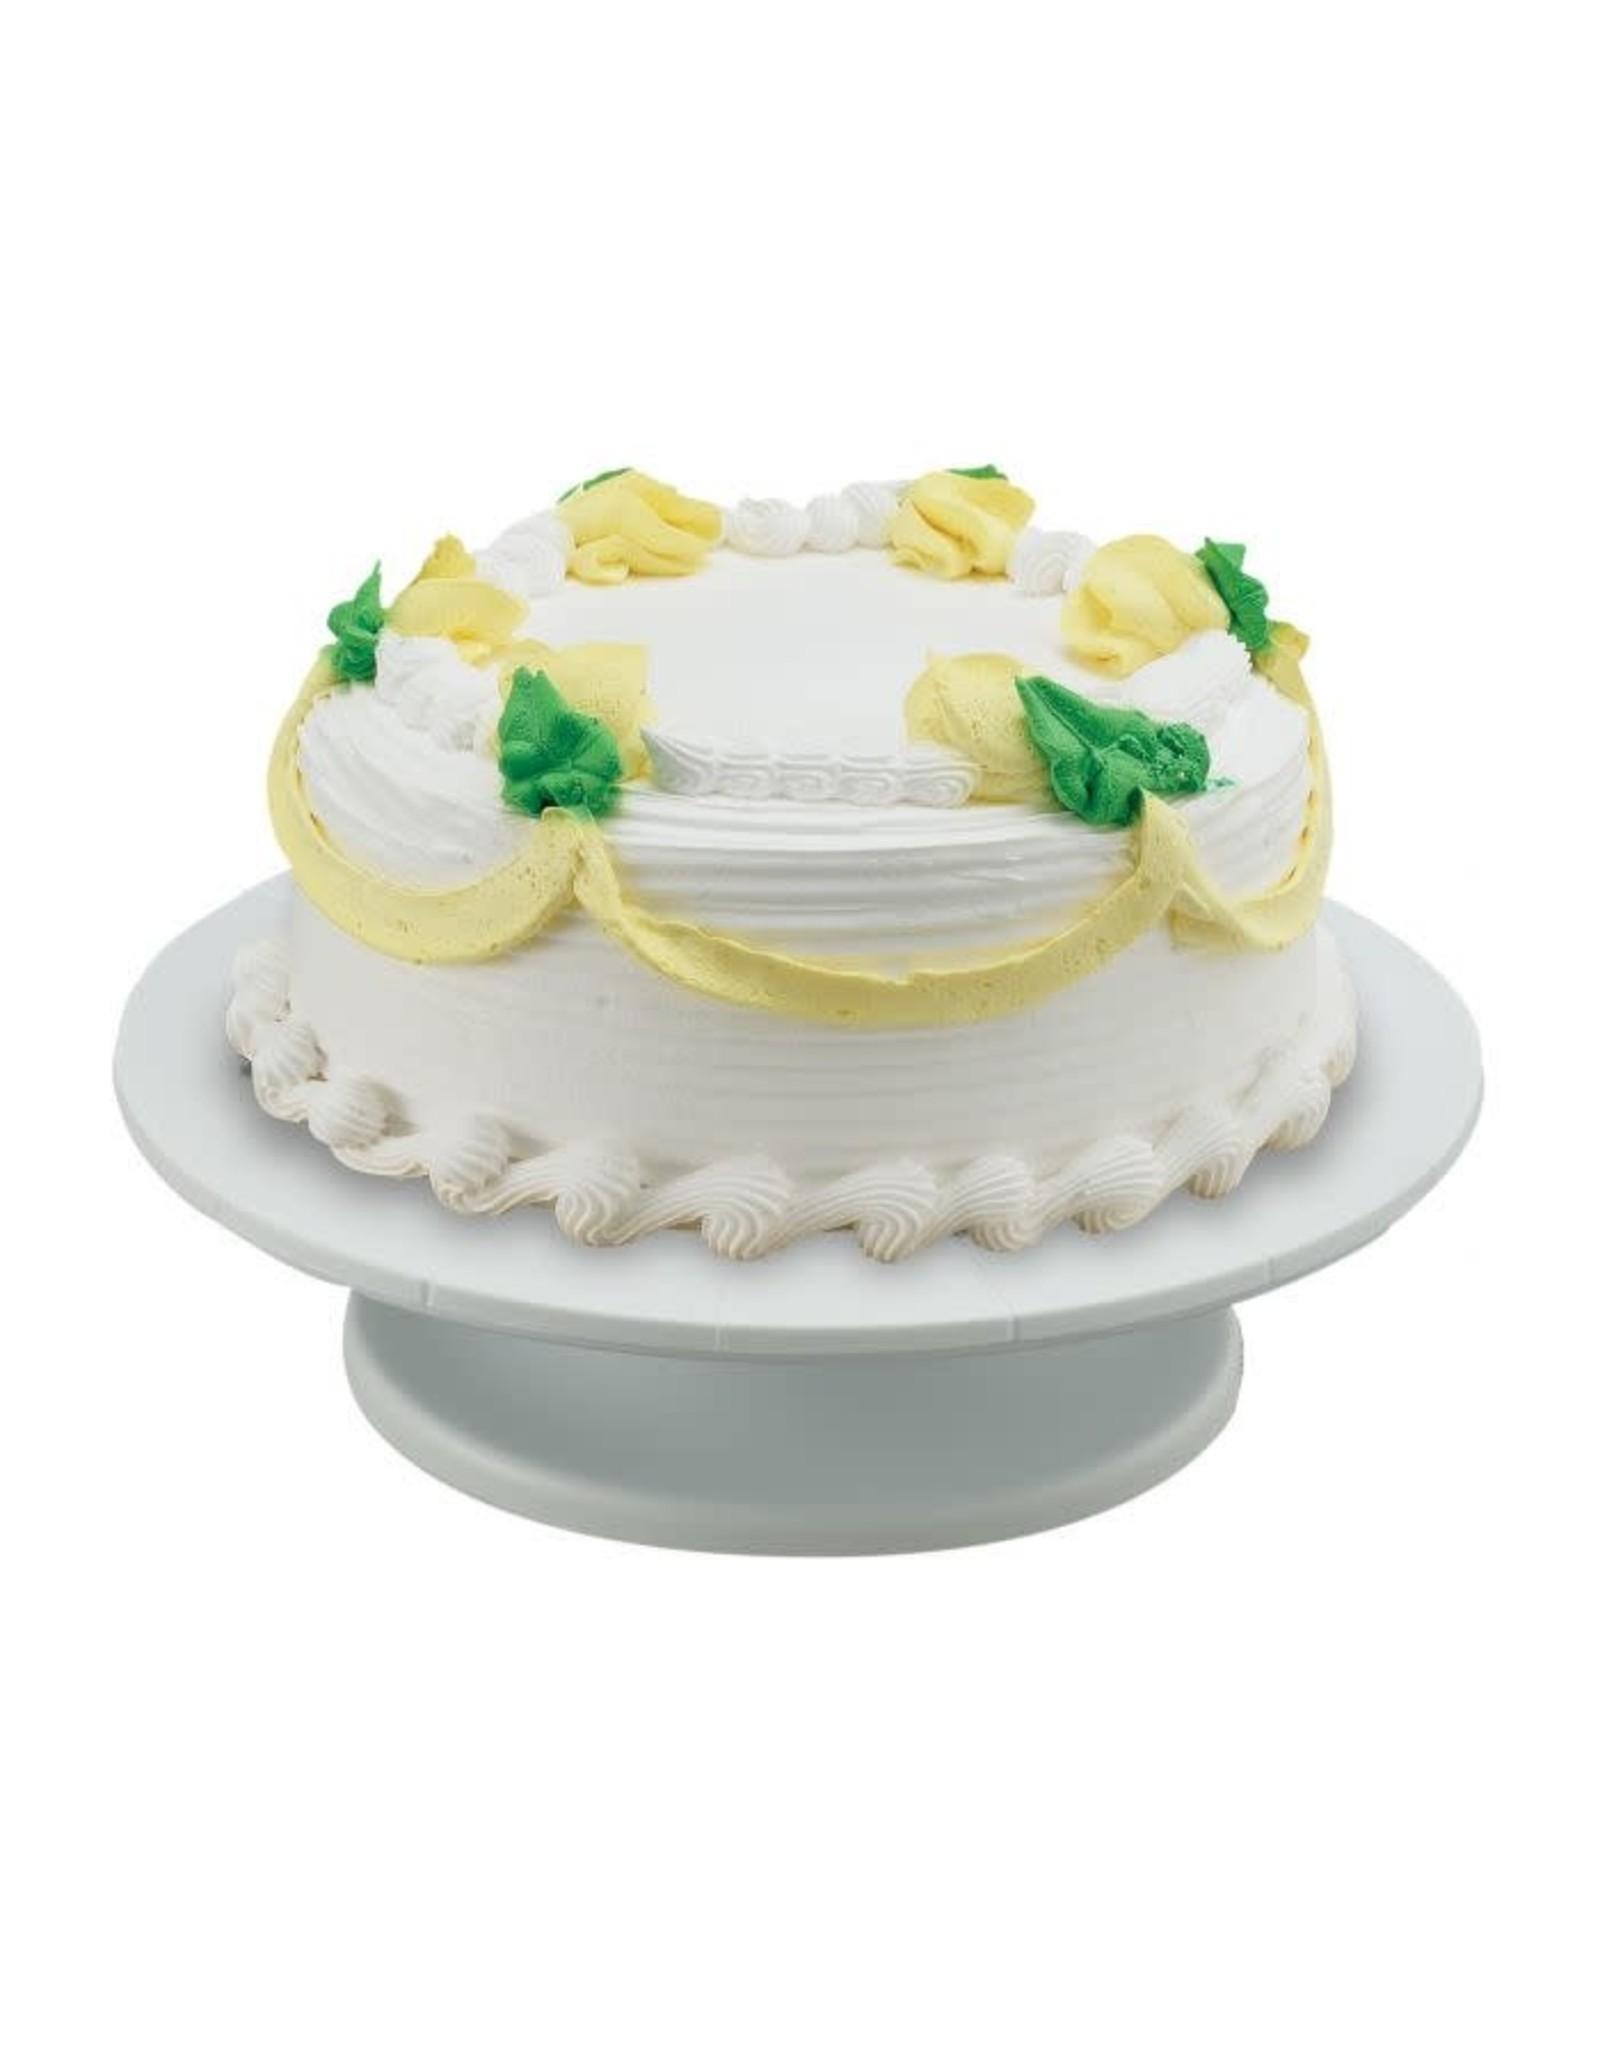 HIC-PLASTIC REVOLVING CAKE